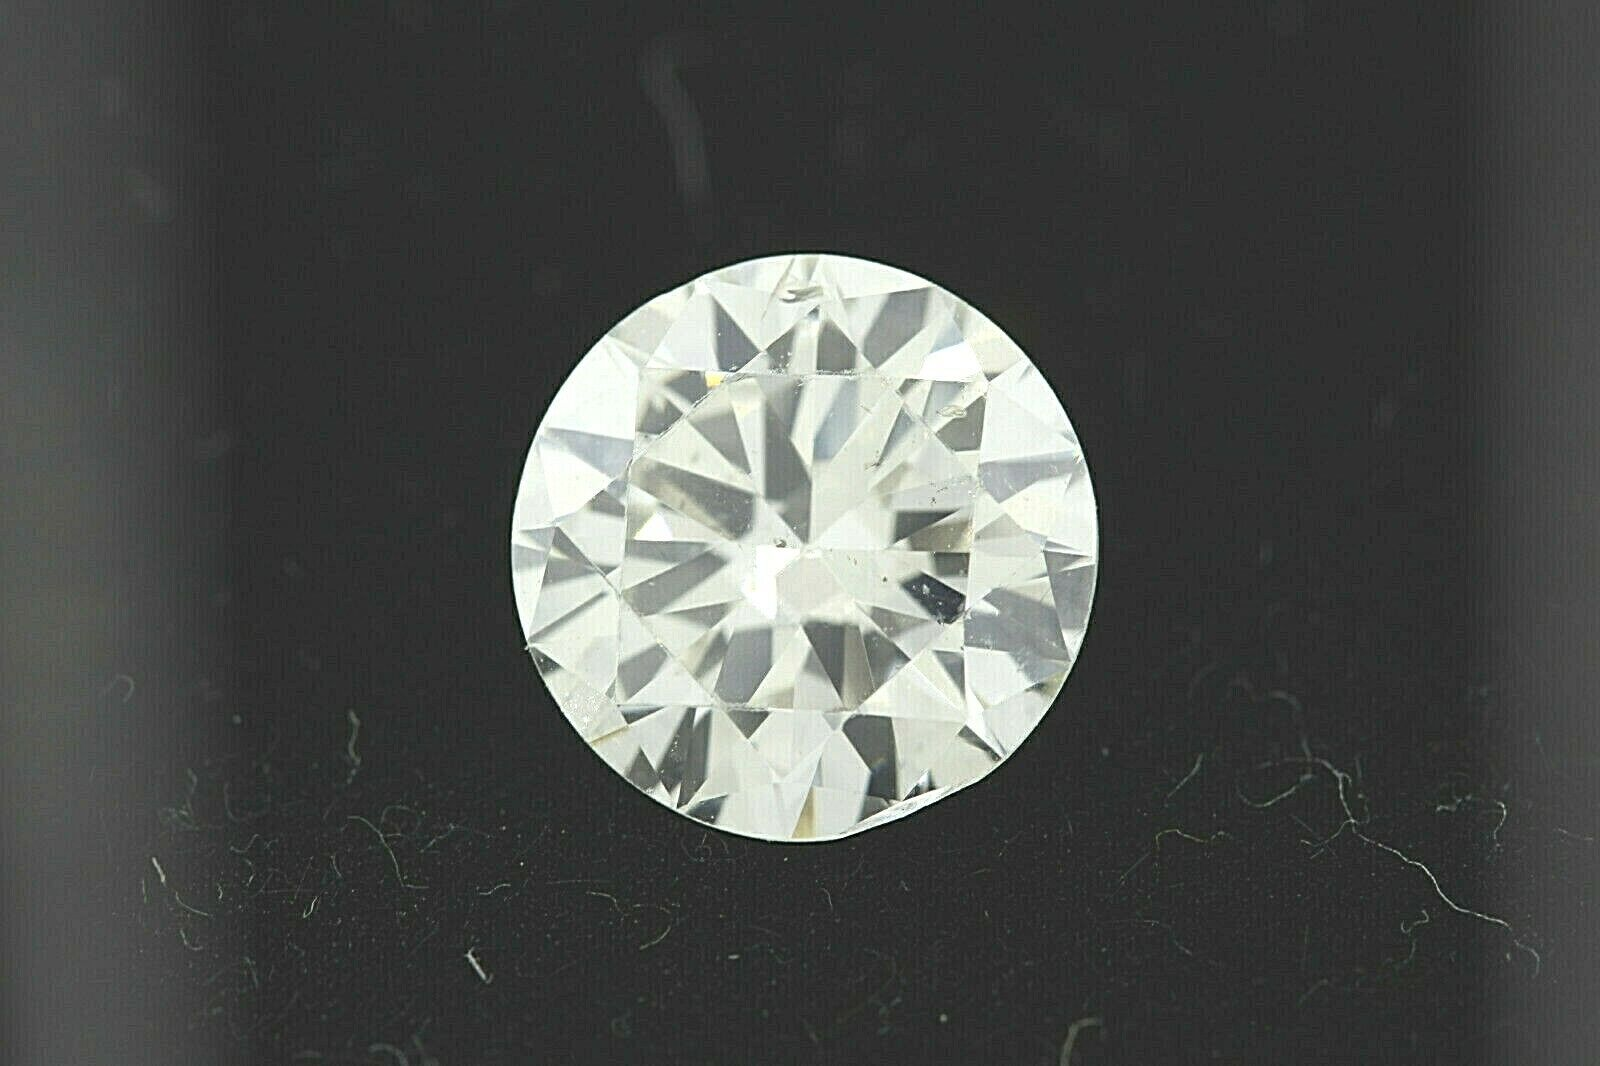 GIA 2.03ct Round Brilliant Loose Diamond J color, SI2 clarity 8.12-8.30 x 4.79mm